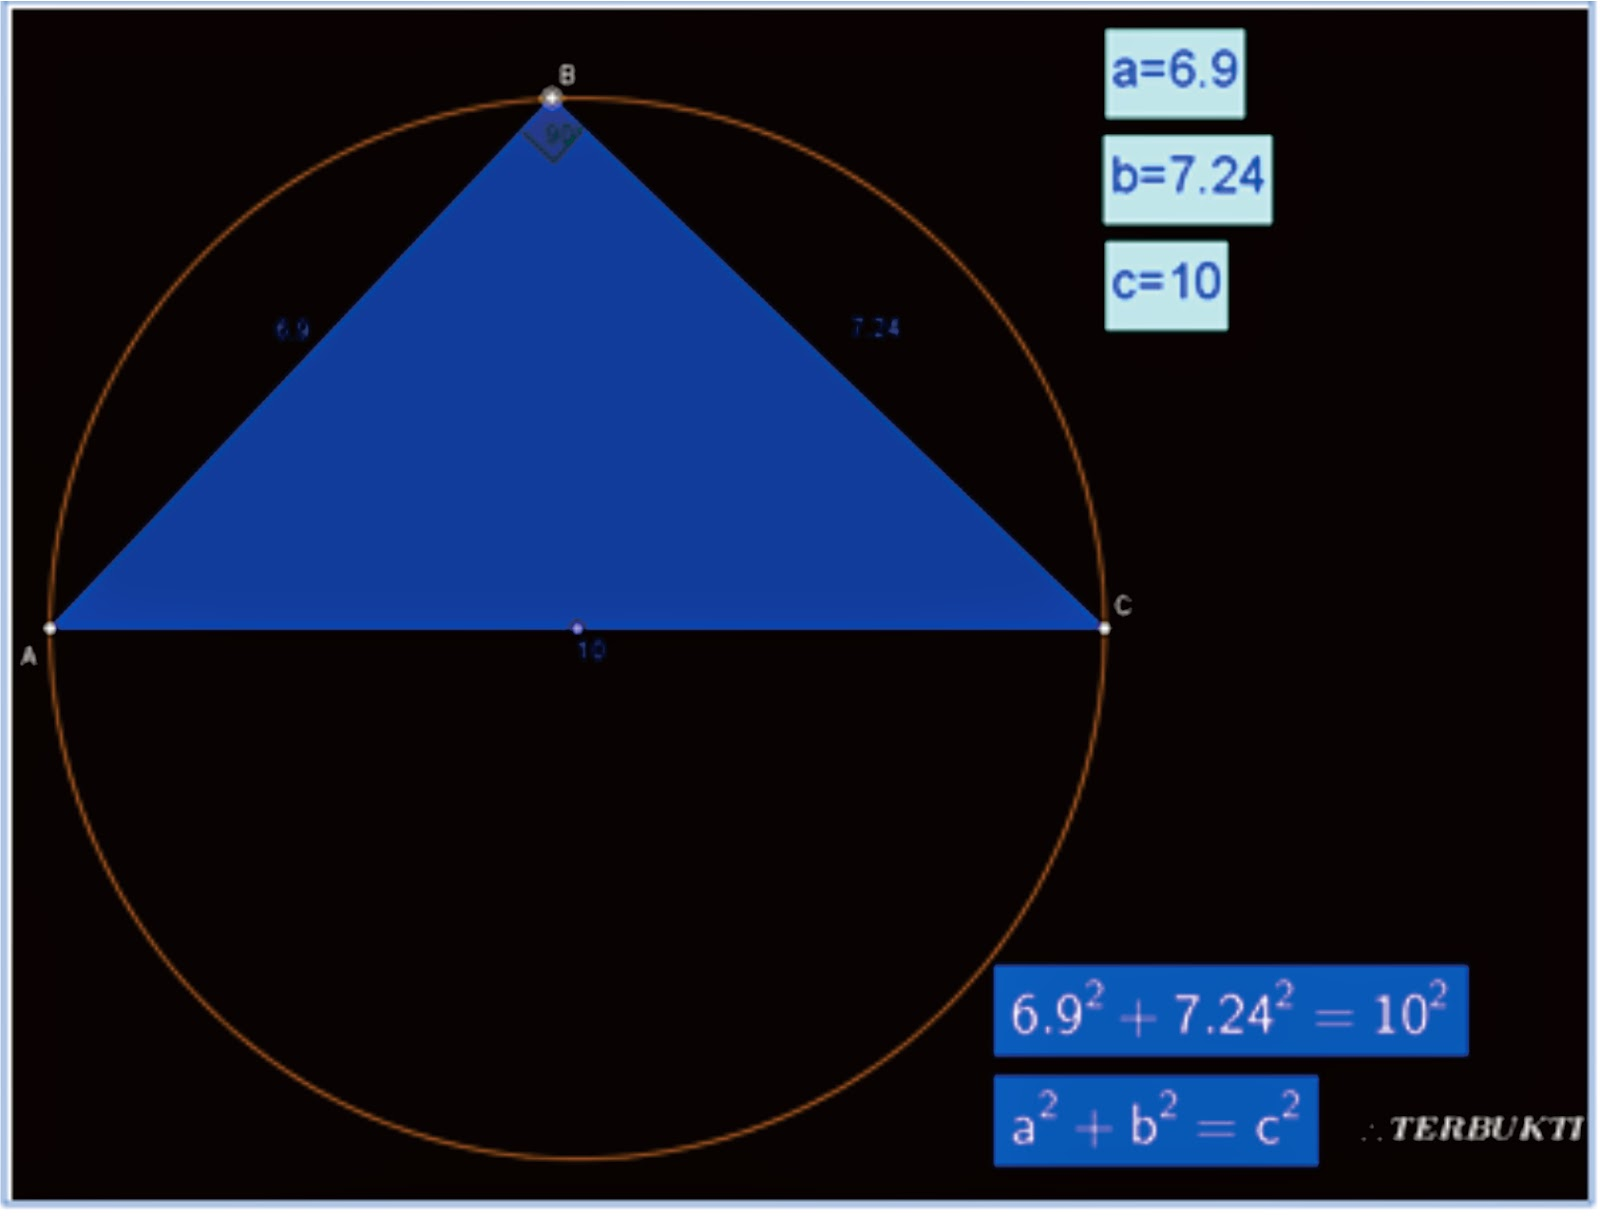 Pembuktian Rumus Pyhtagoras dengan Software Geogebra